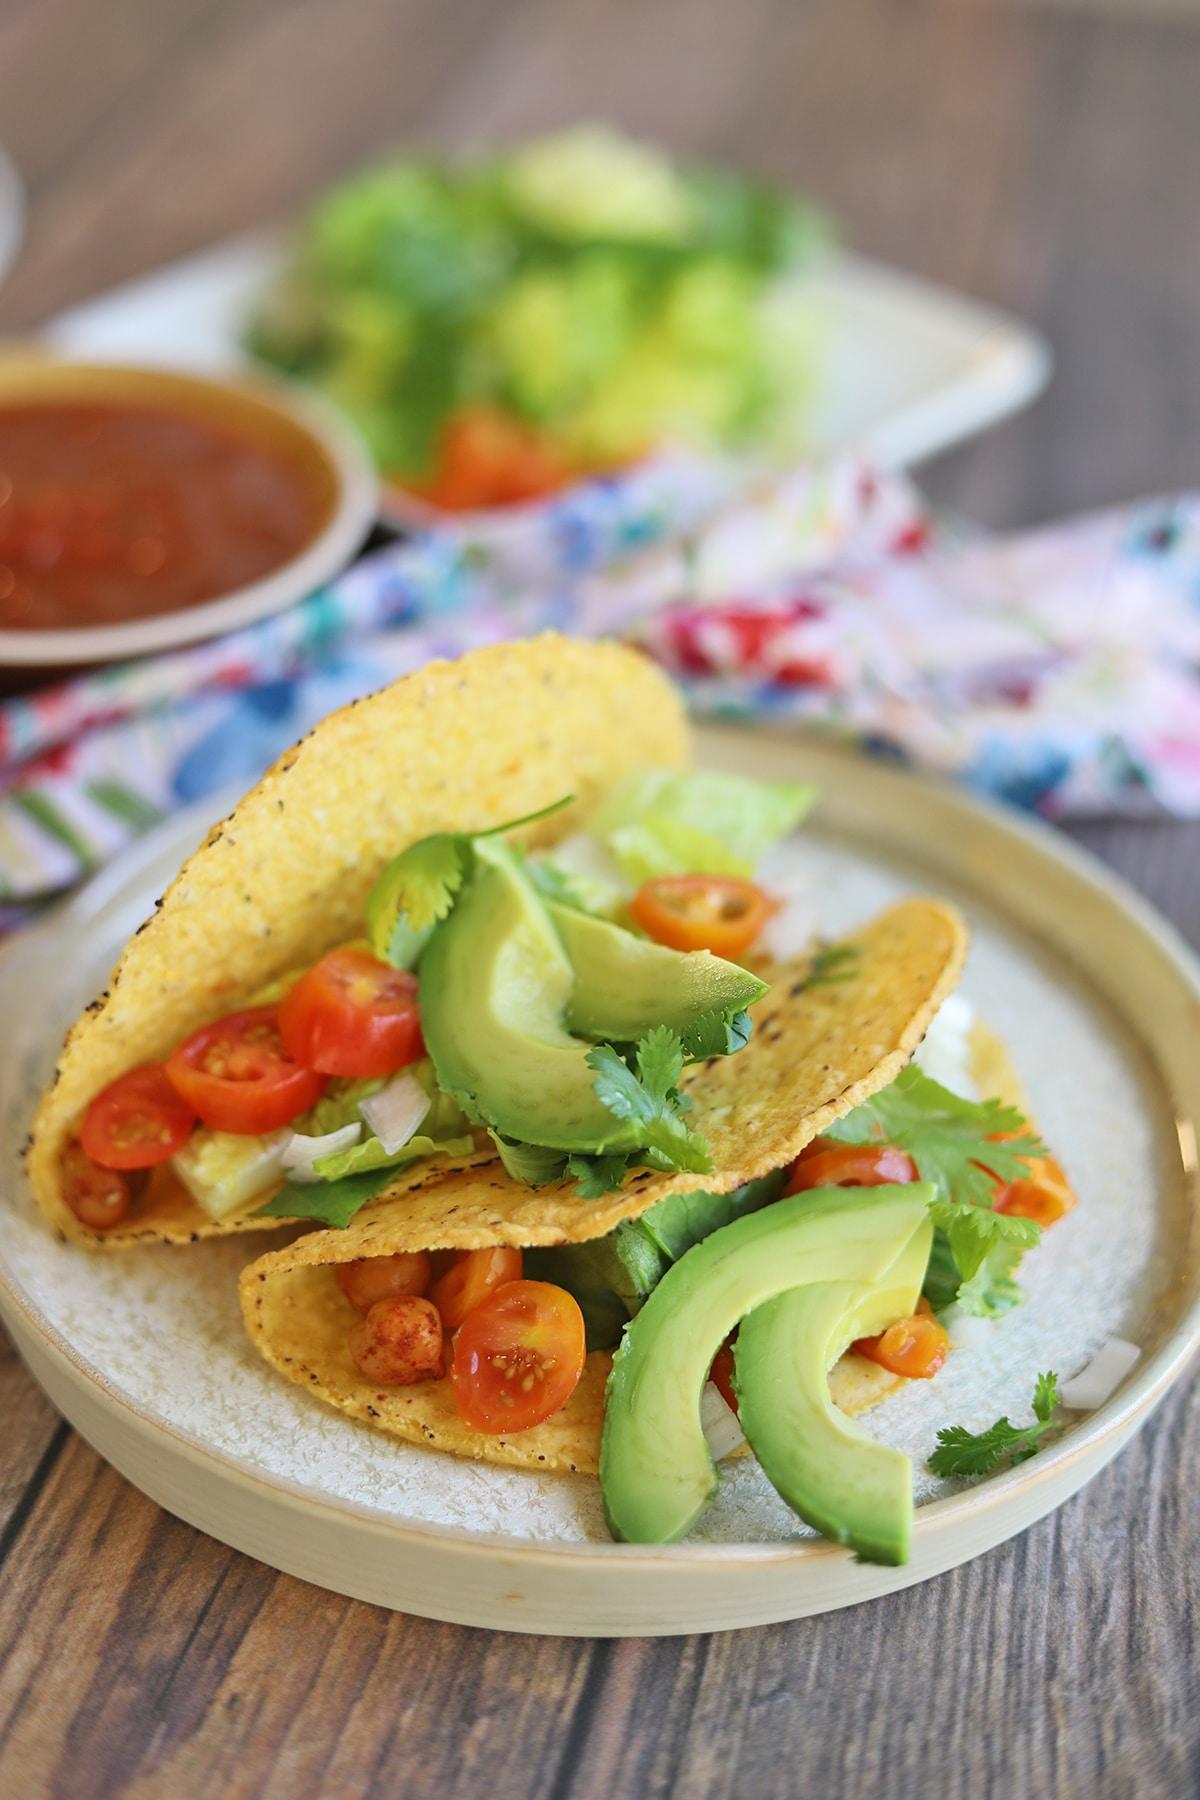 Garbanzo bean tacos on plate.